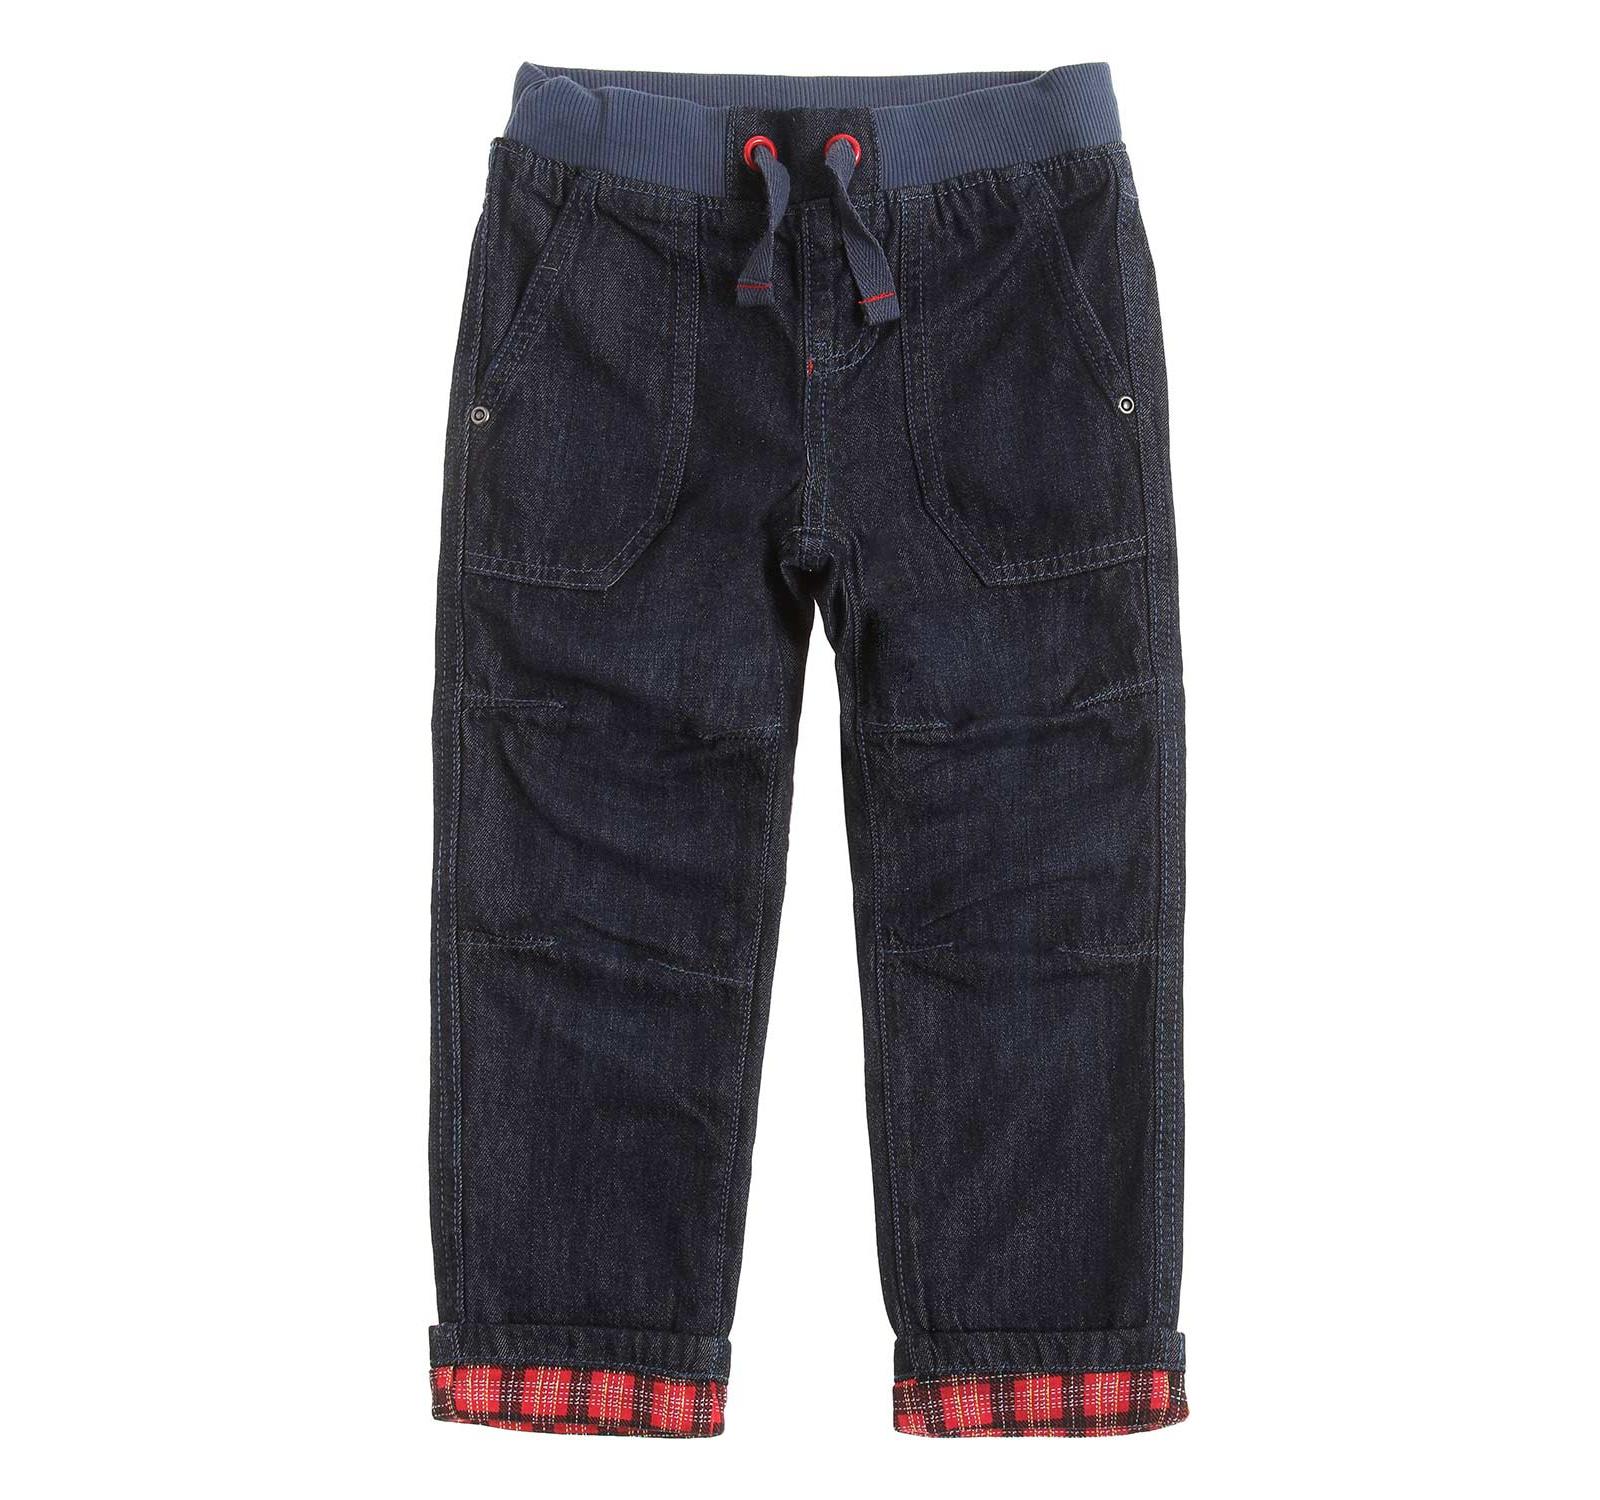 Pantaloni Denim, dublati Bleumarin